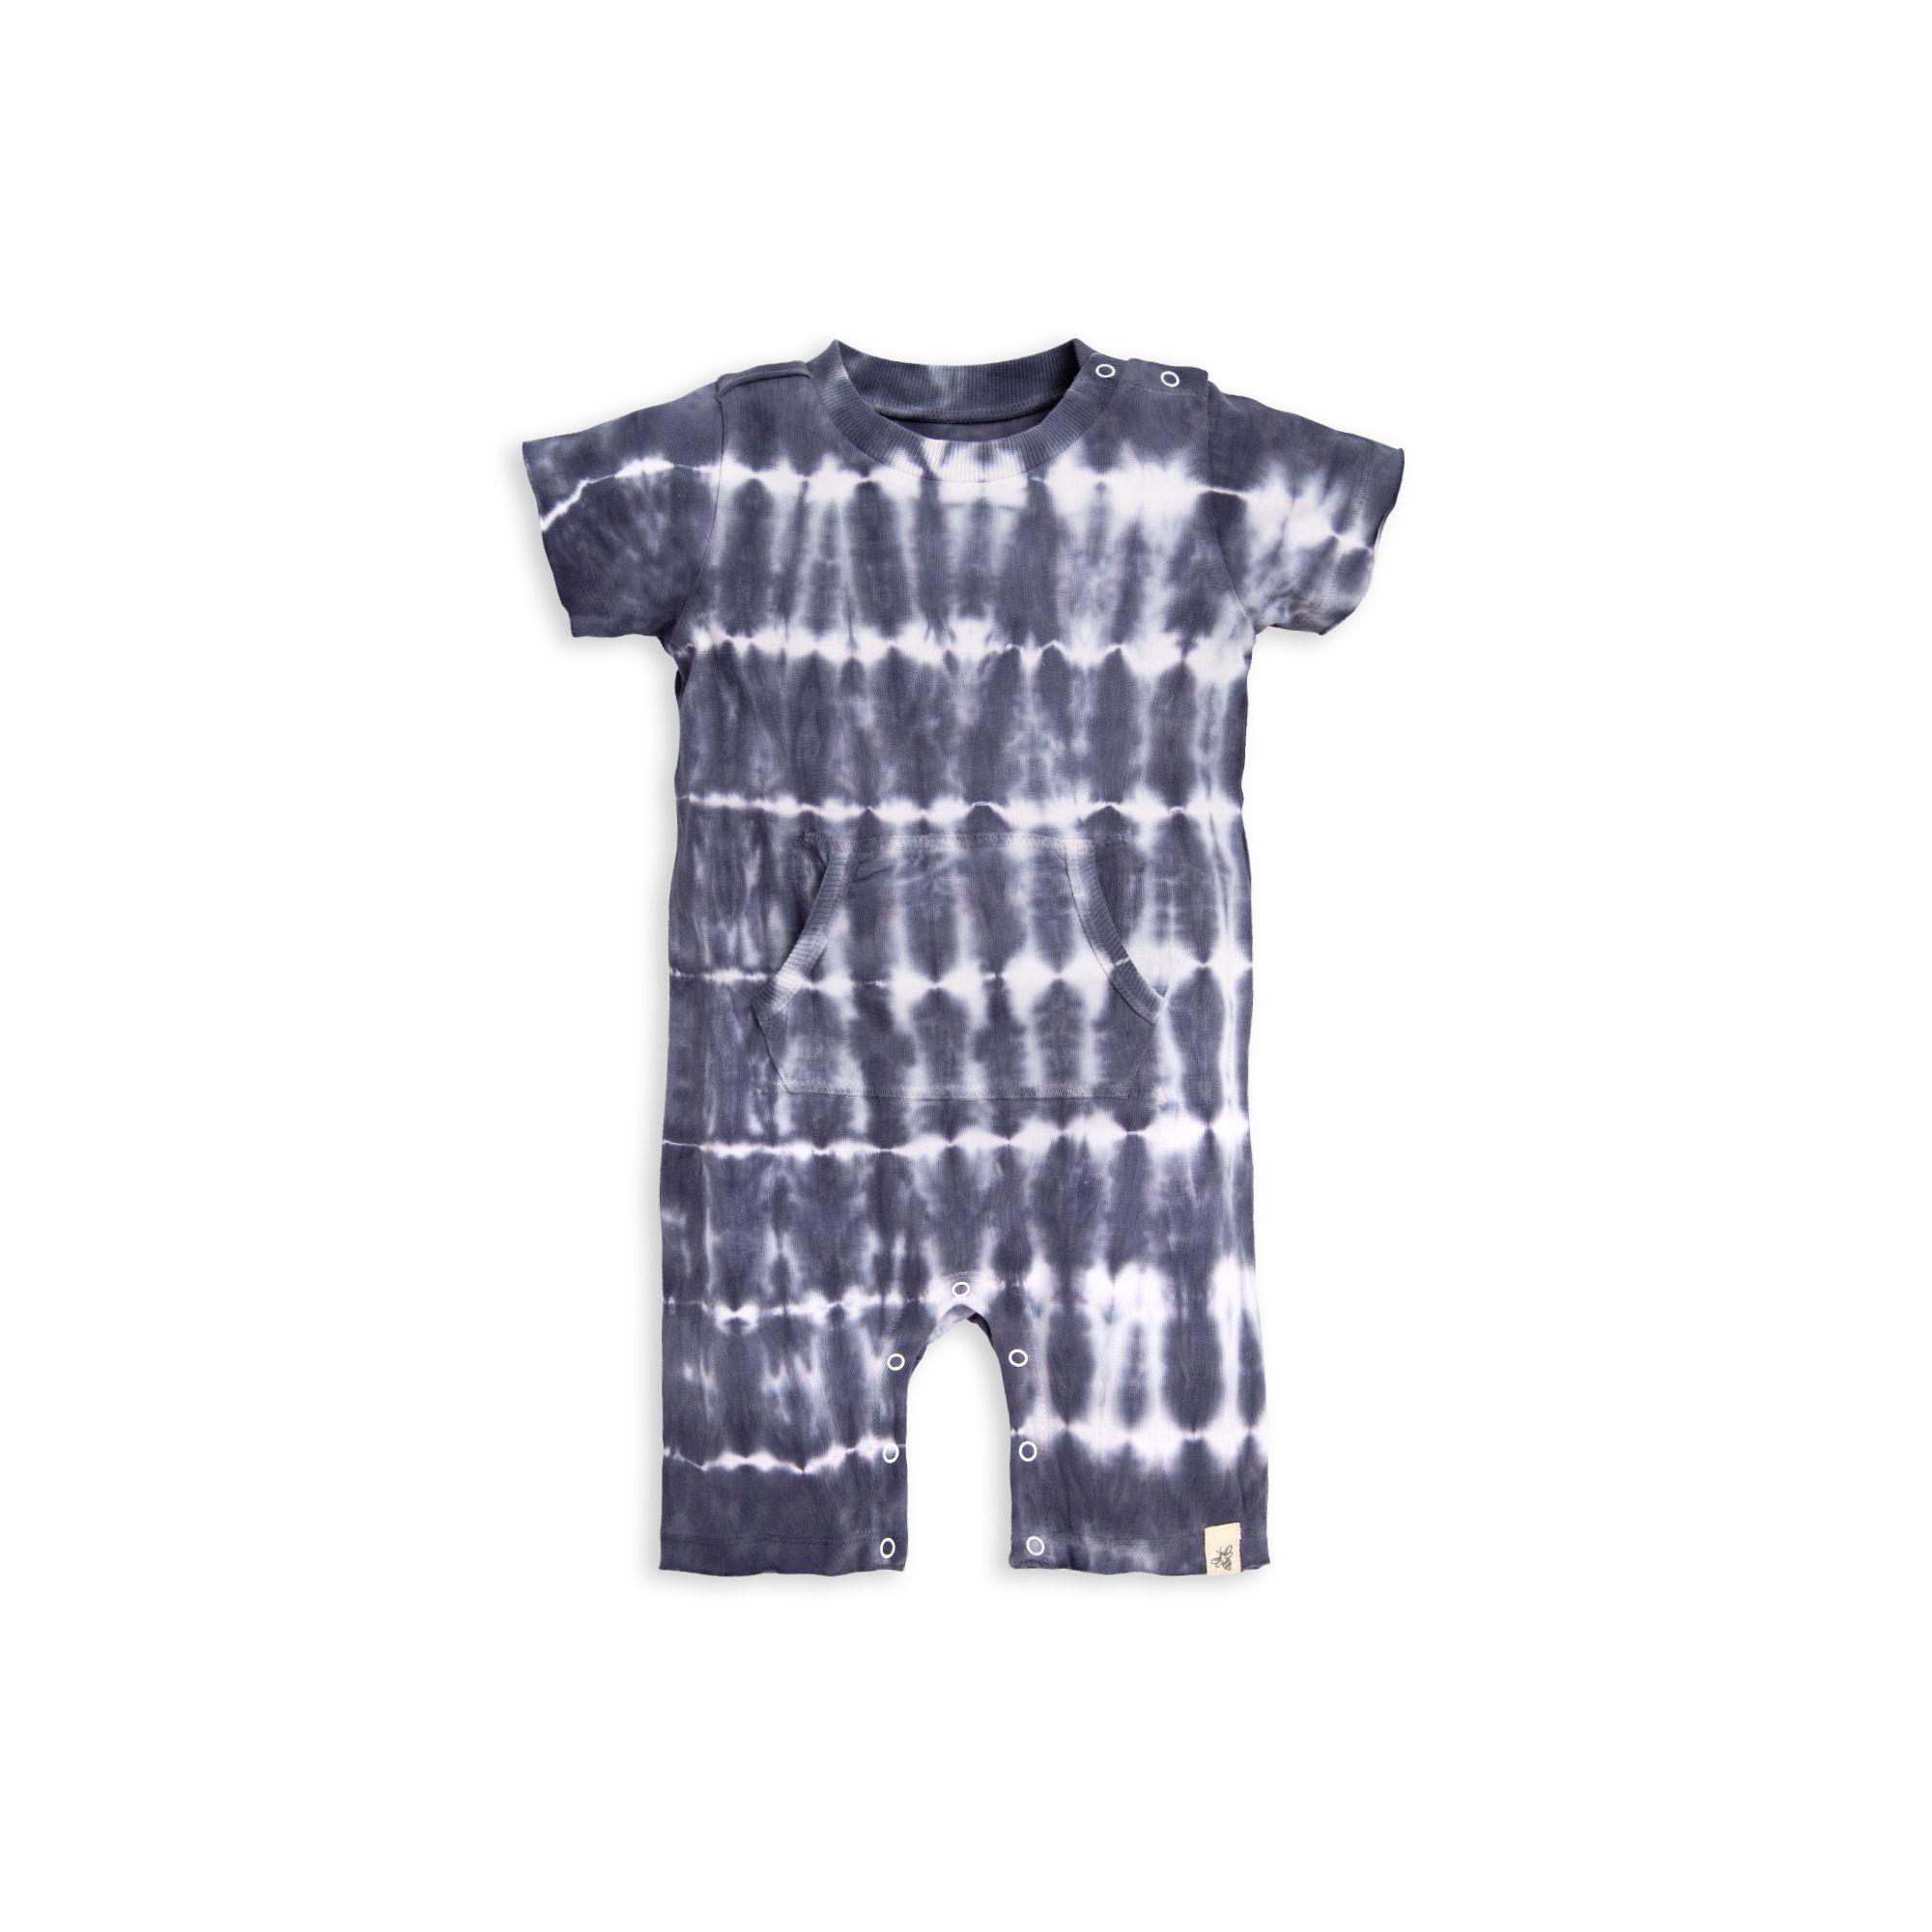 Tie Dye Baby Romper Hand Dyed Tie Dye Hippie Baby Clothing Tie Dye Baby Clothes Boho Baby Clothes